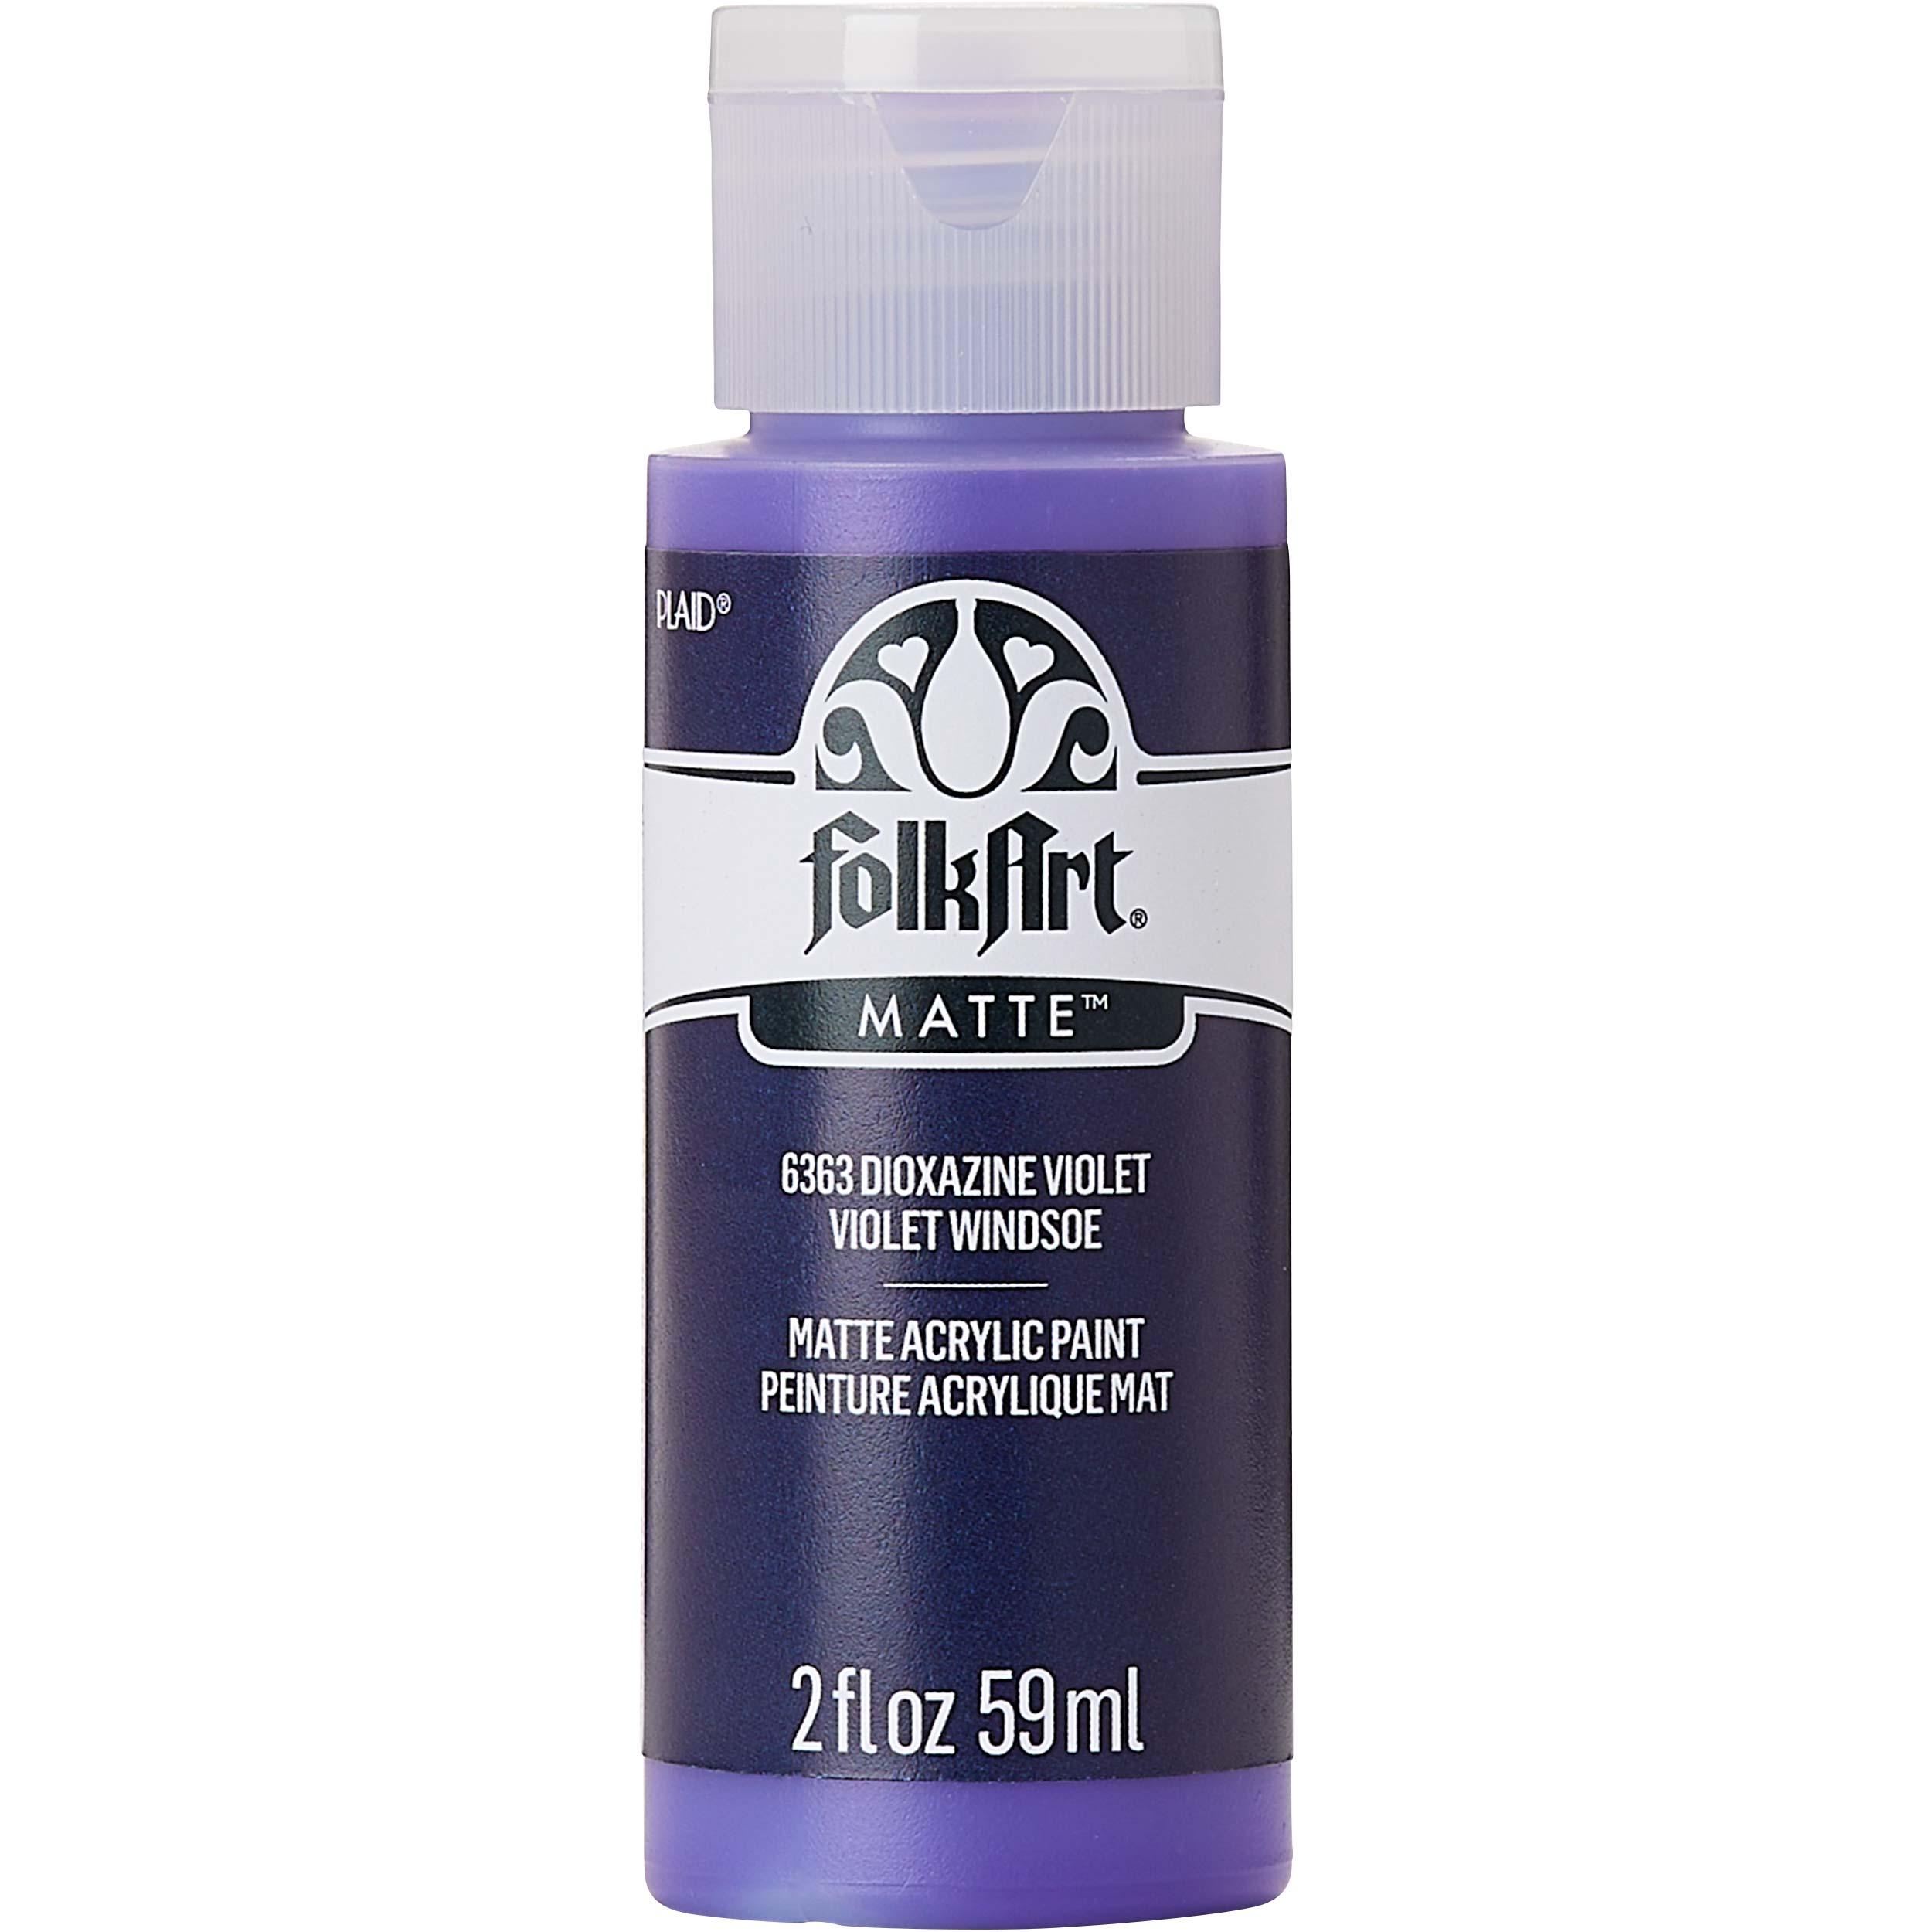 FolkArt ® Acrylic Colors - Dioxazine Violet, 2 oz.